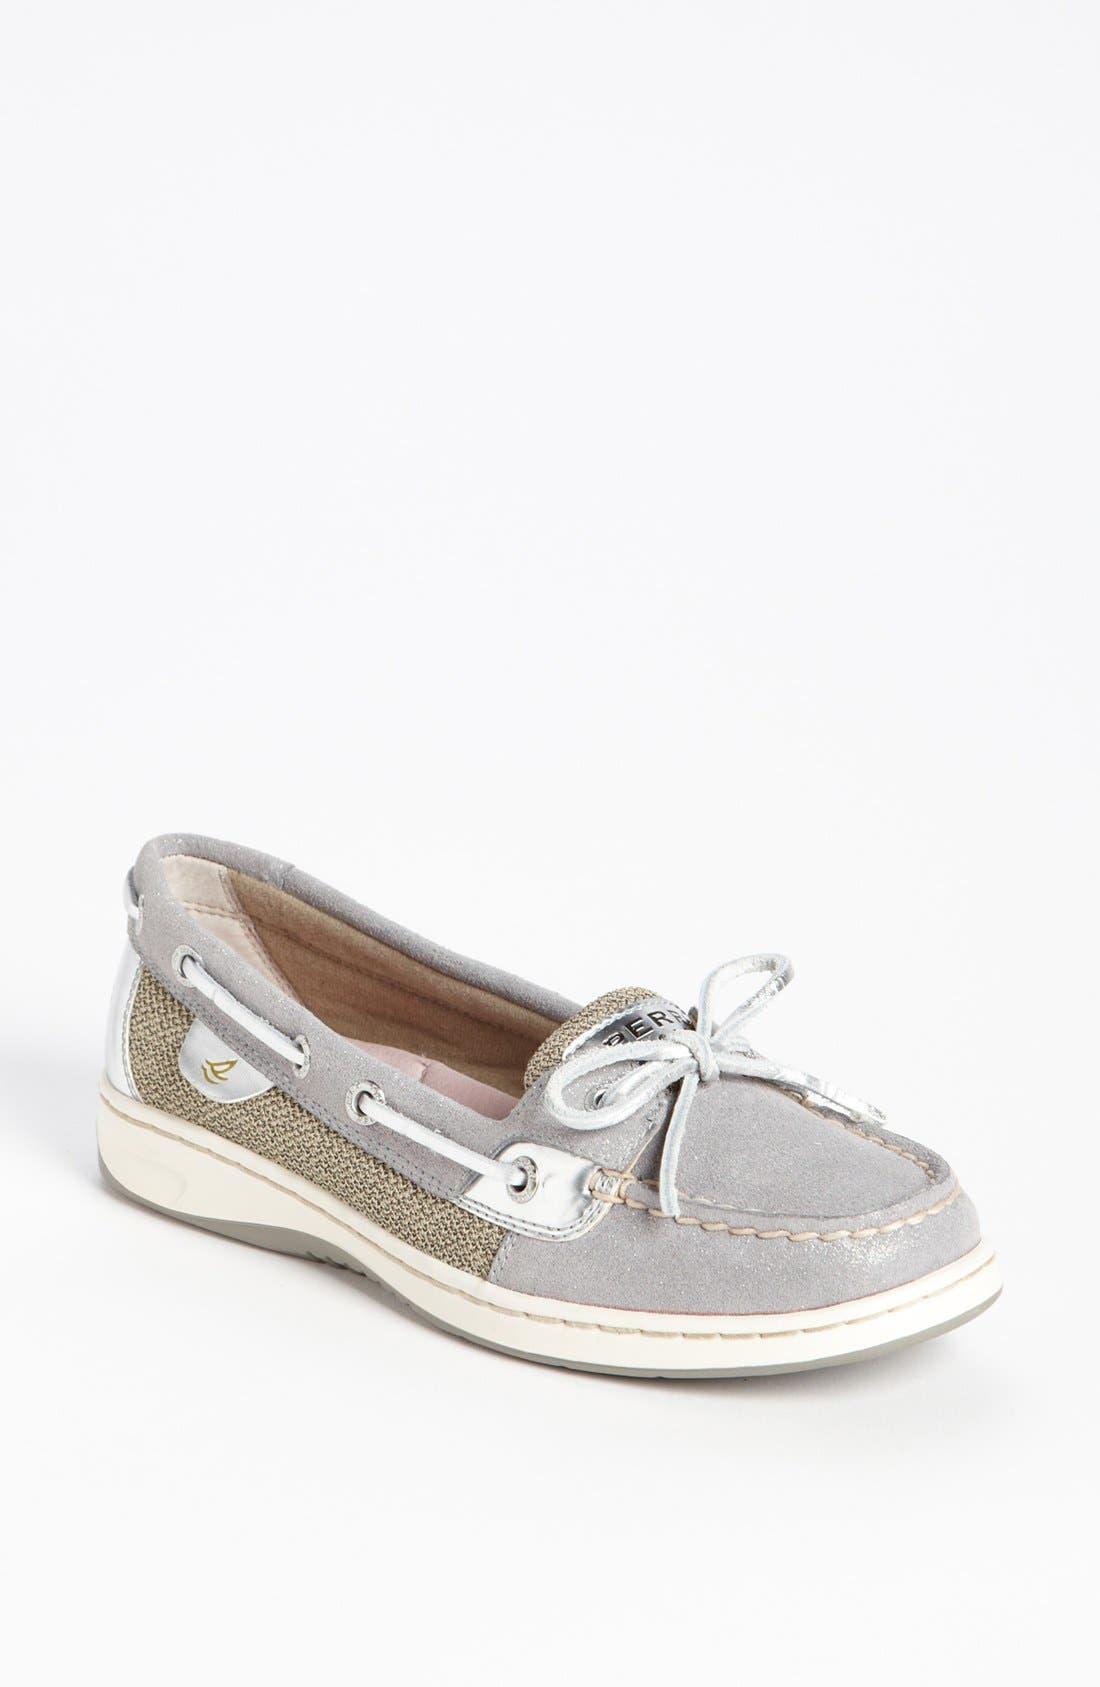 Alternate Image 1 Selected - Sperry 'Angelfish' Boat Shoe (Women)